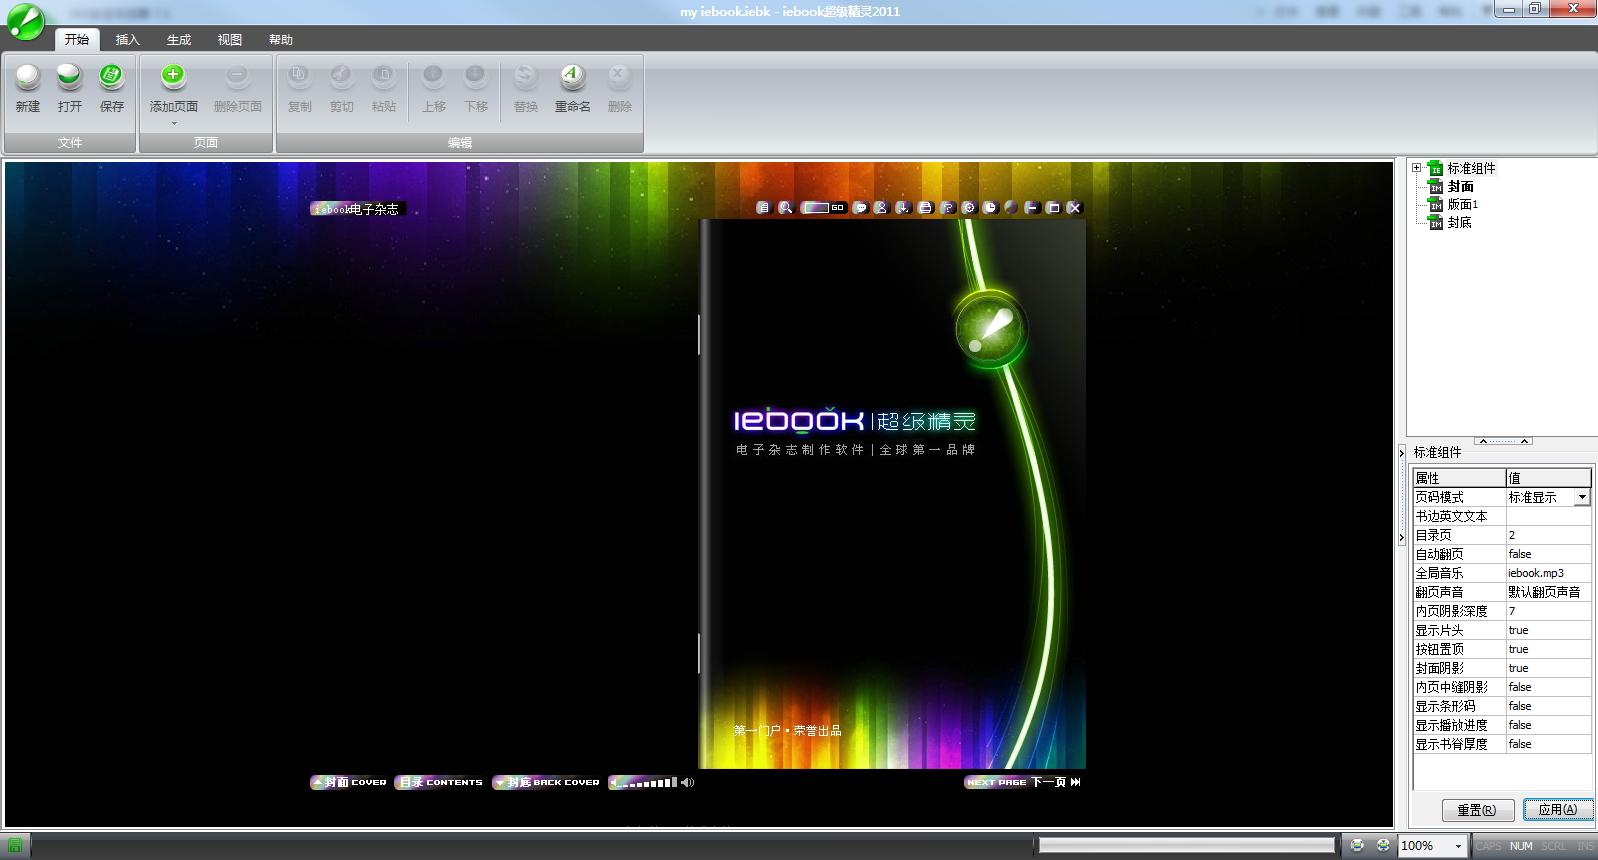 iebook超级精灵截图3